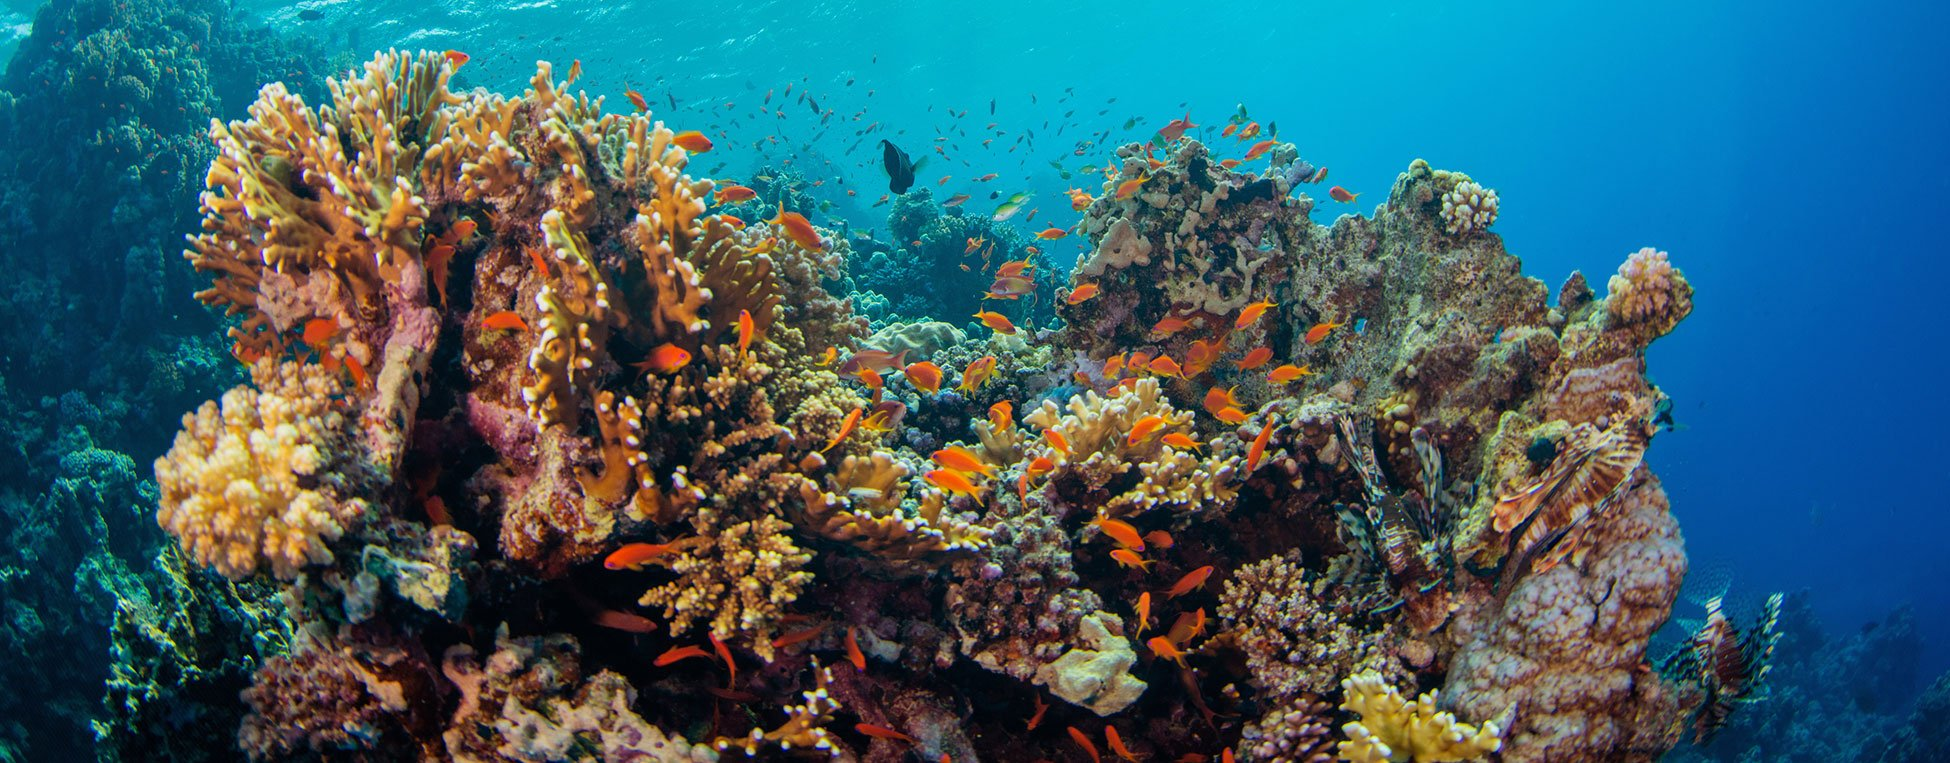 Seychelles coral reef